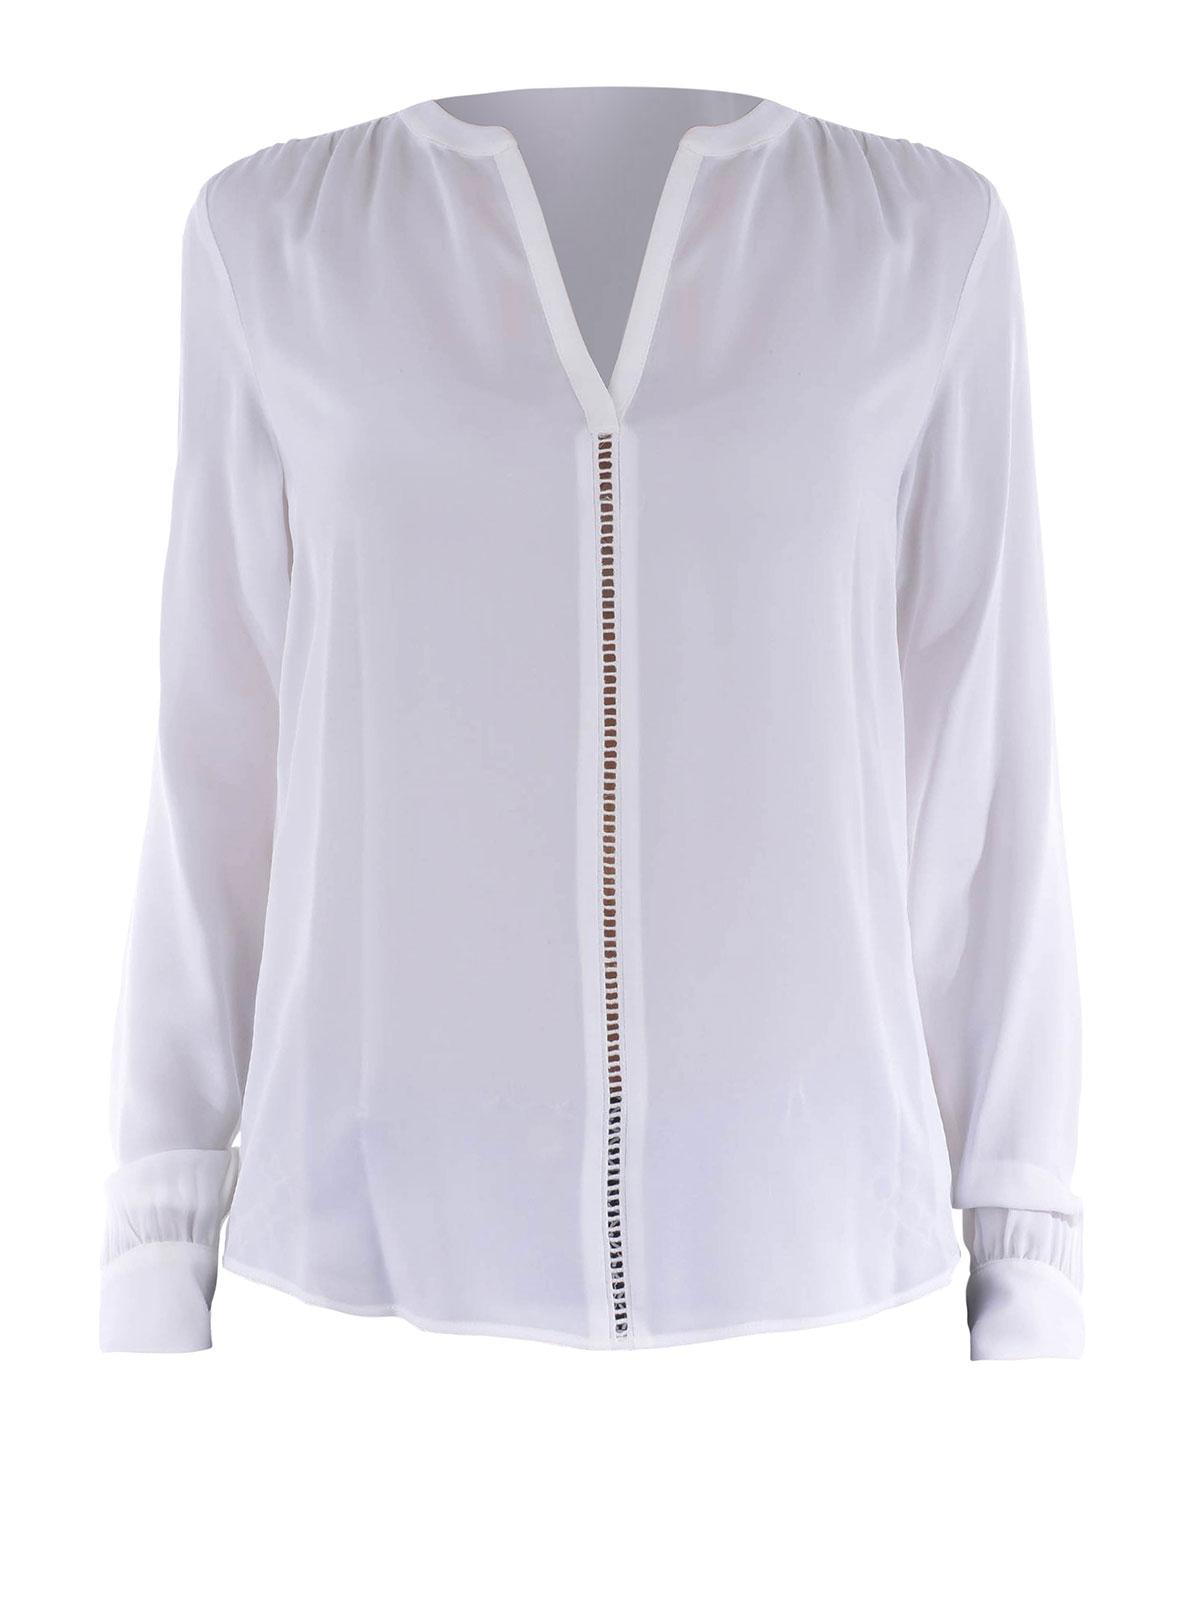 michael kors silk blouse mexican blouse. Black Bedroom Furniture Sets. Home Design Ideas